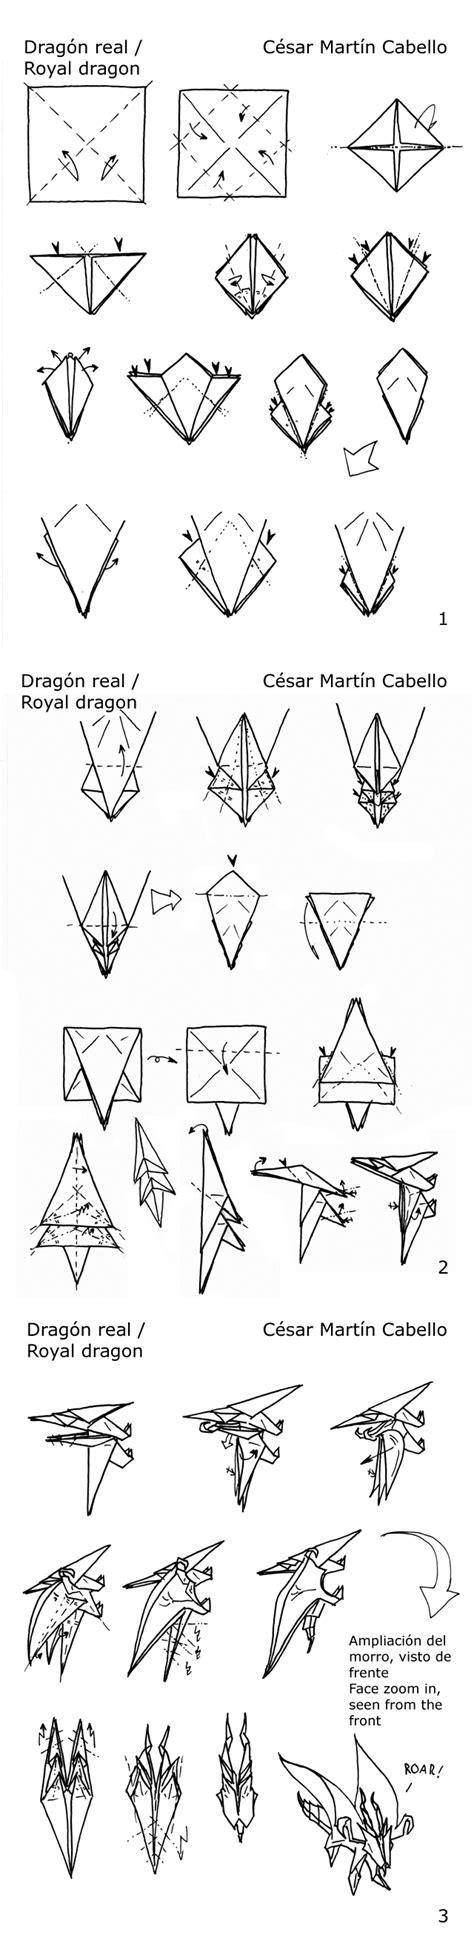 Origami Dragonfly Diagram - origami royal diagrams by pepius on deviantart